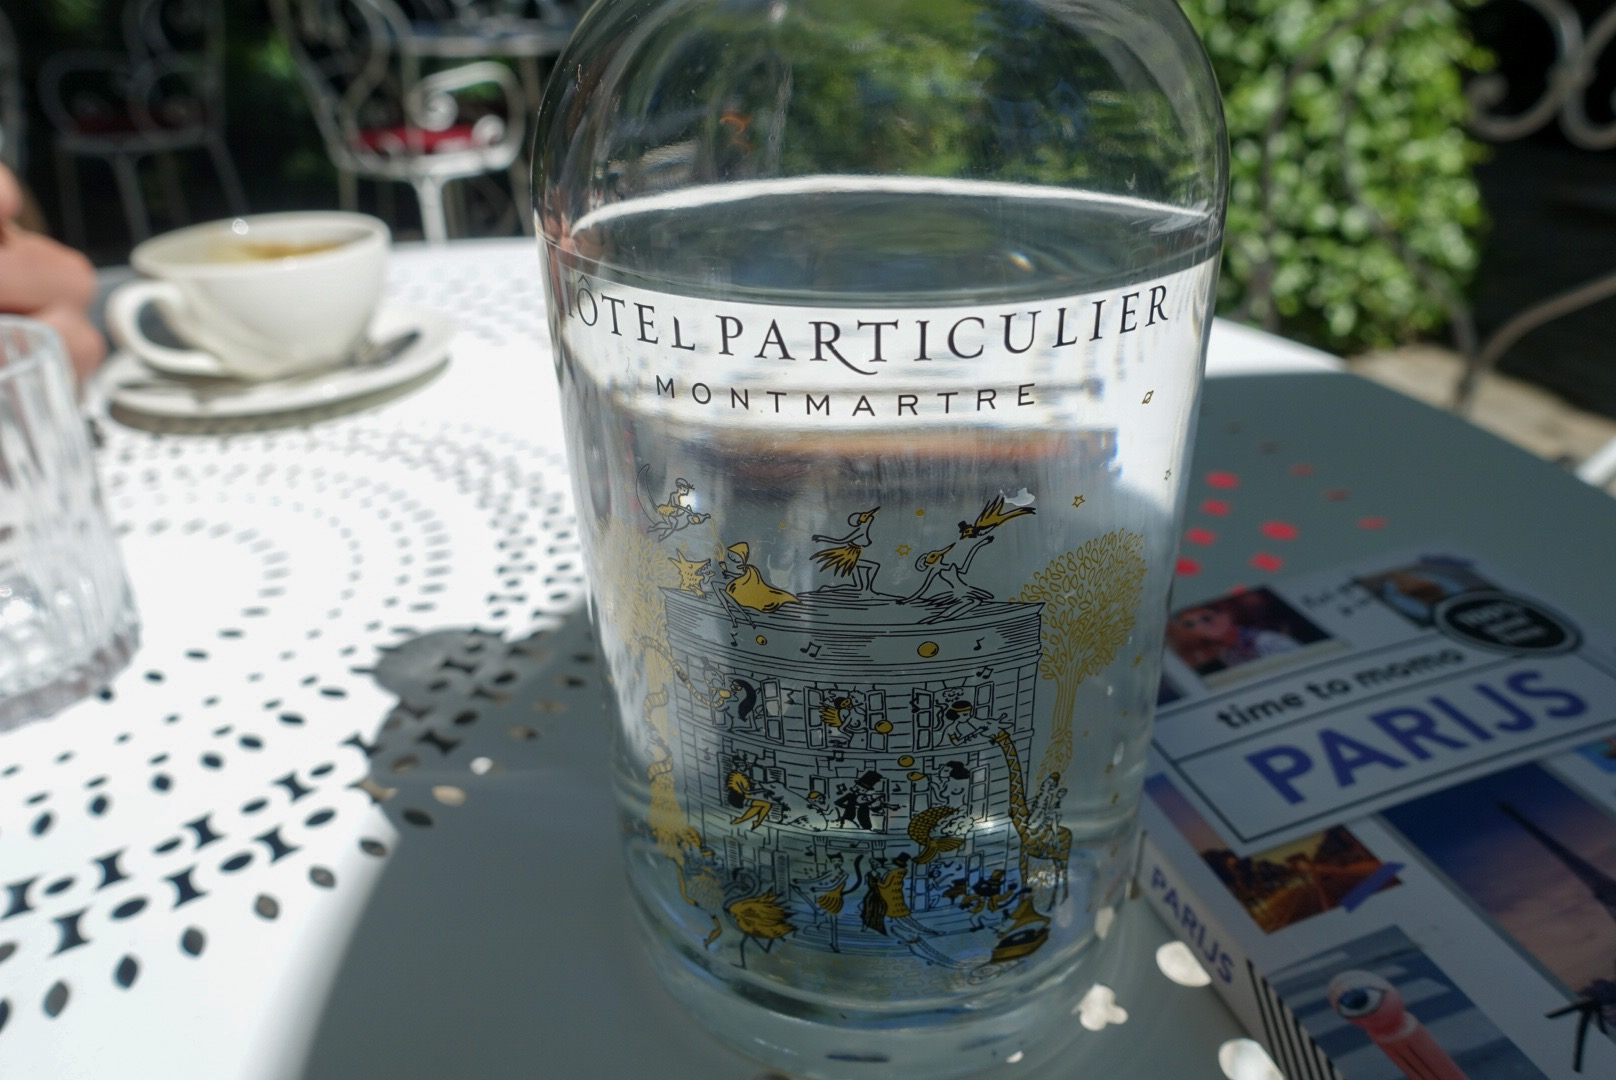 Parijs Hotel Particulier Montmartre fles water reisgids